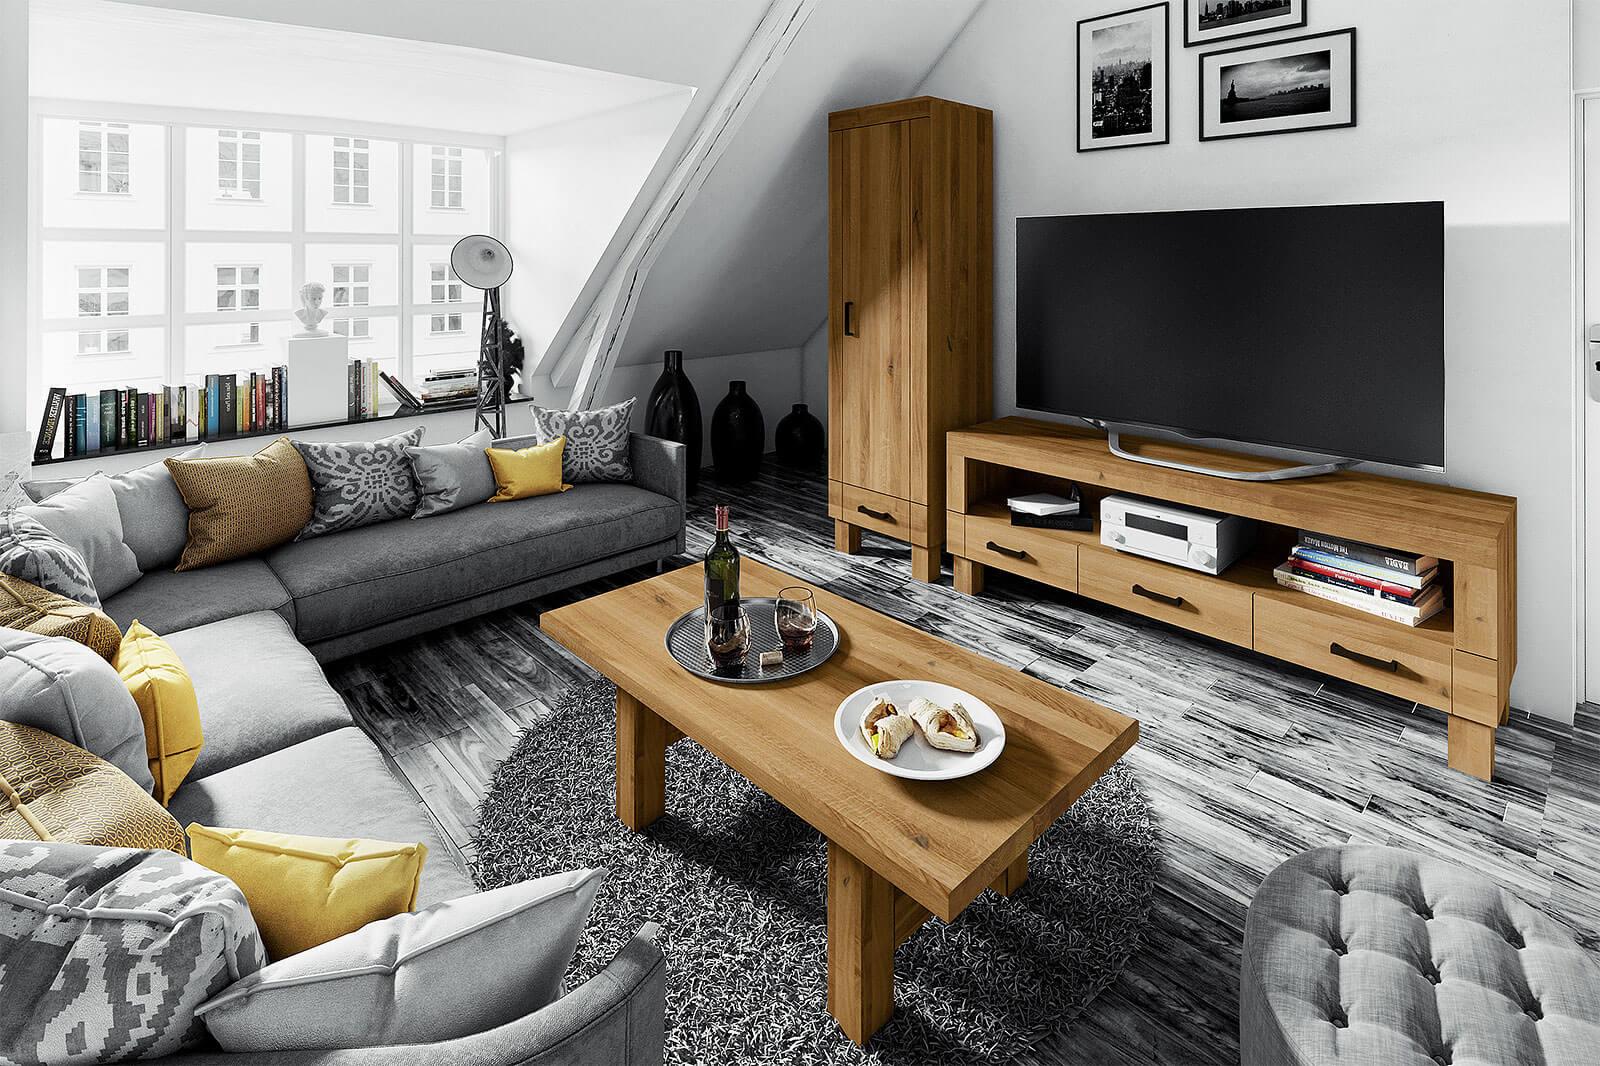 Mieszkanie na poddaszu - meble